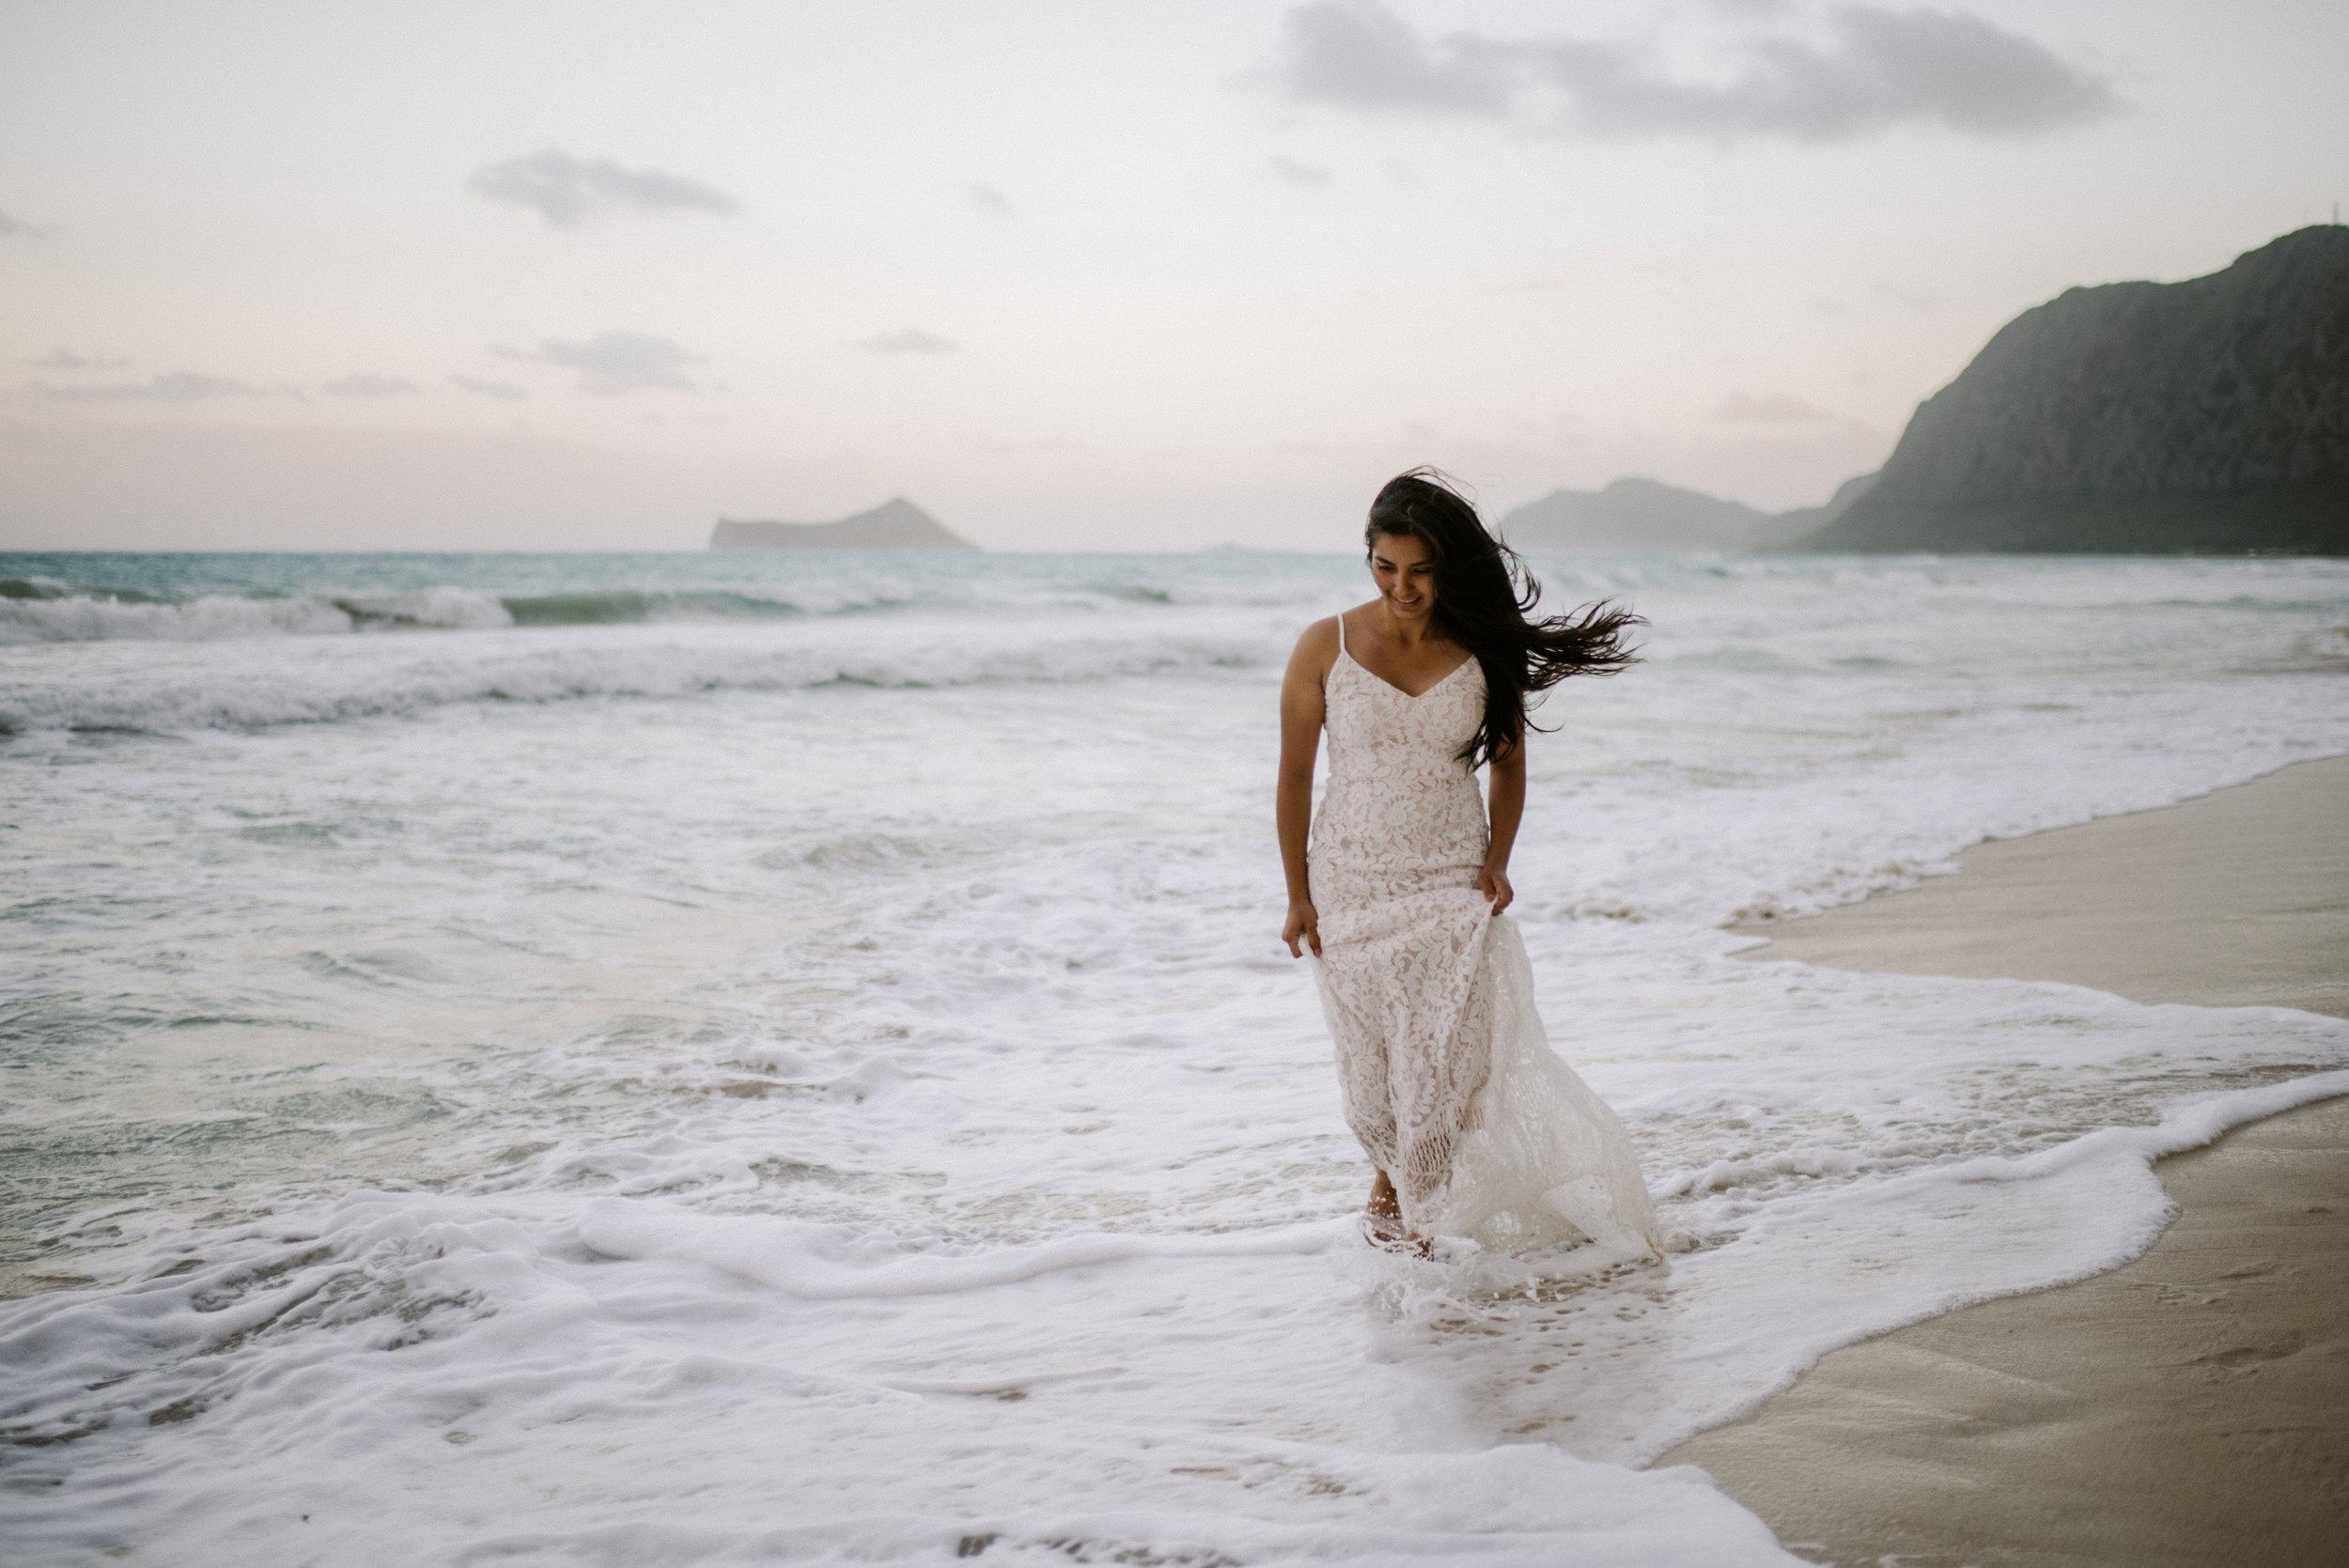 Hawaii bride on a beach